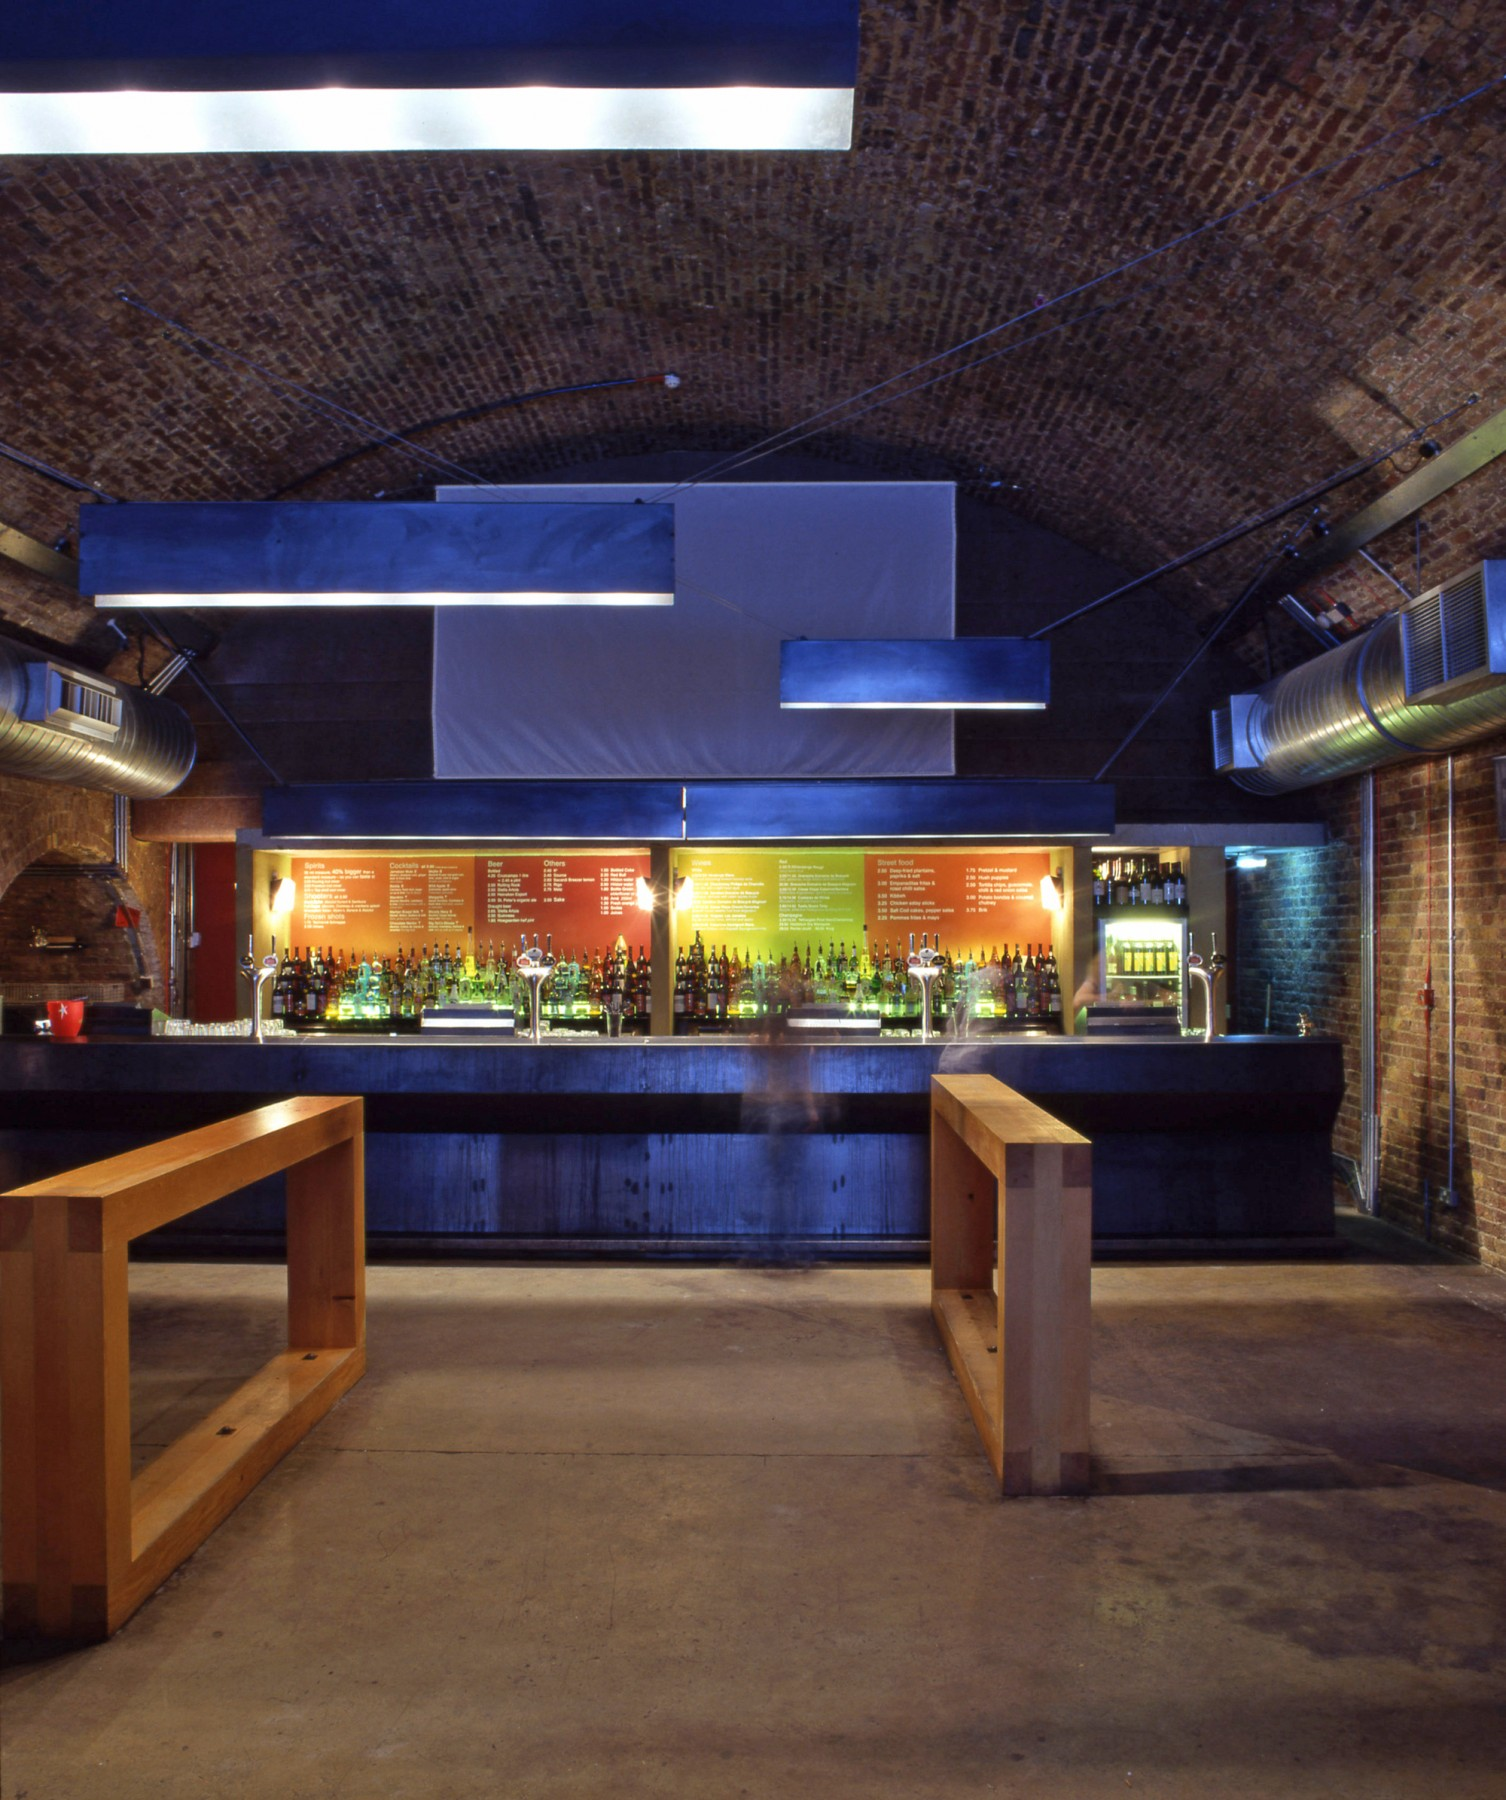 Cargo-East-London-Shoreditch-cultural-scene-bar-restaurant-urban-disused-railway-yard-entertainment-venue-events-Jamie-Fobert-Architects-4